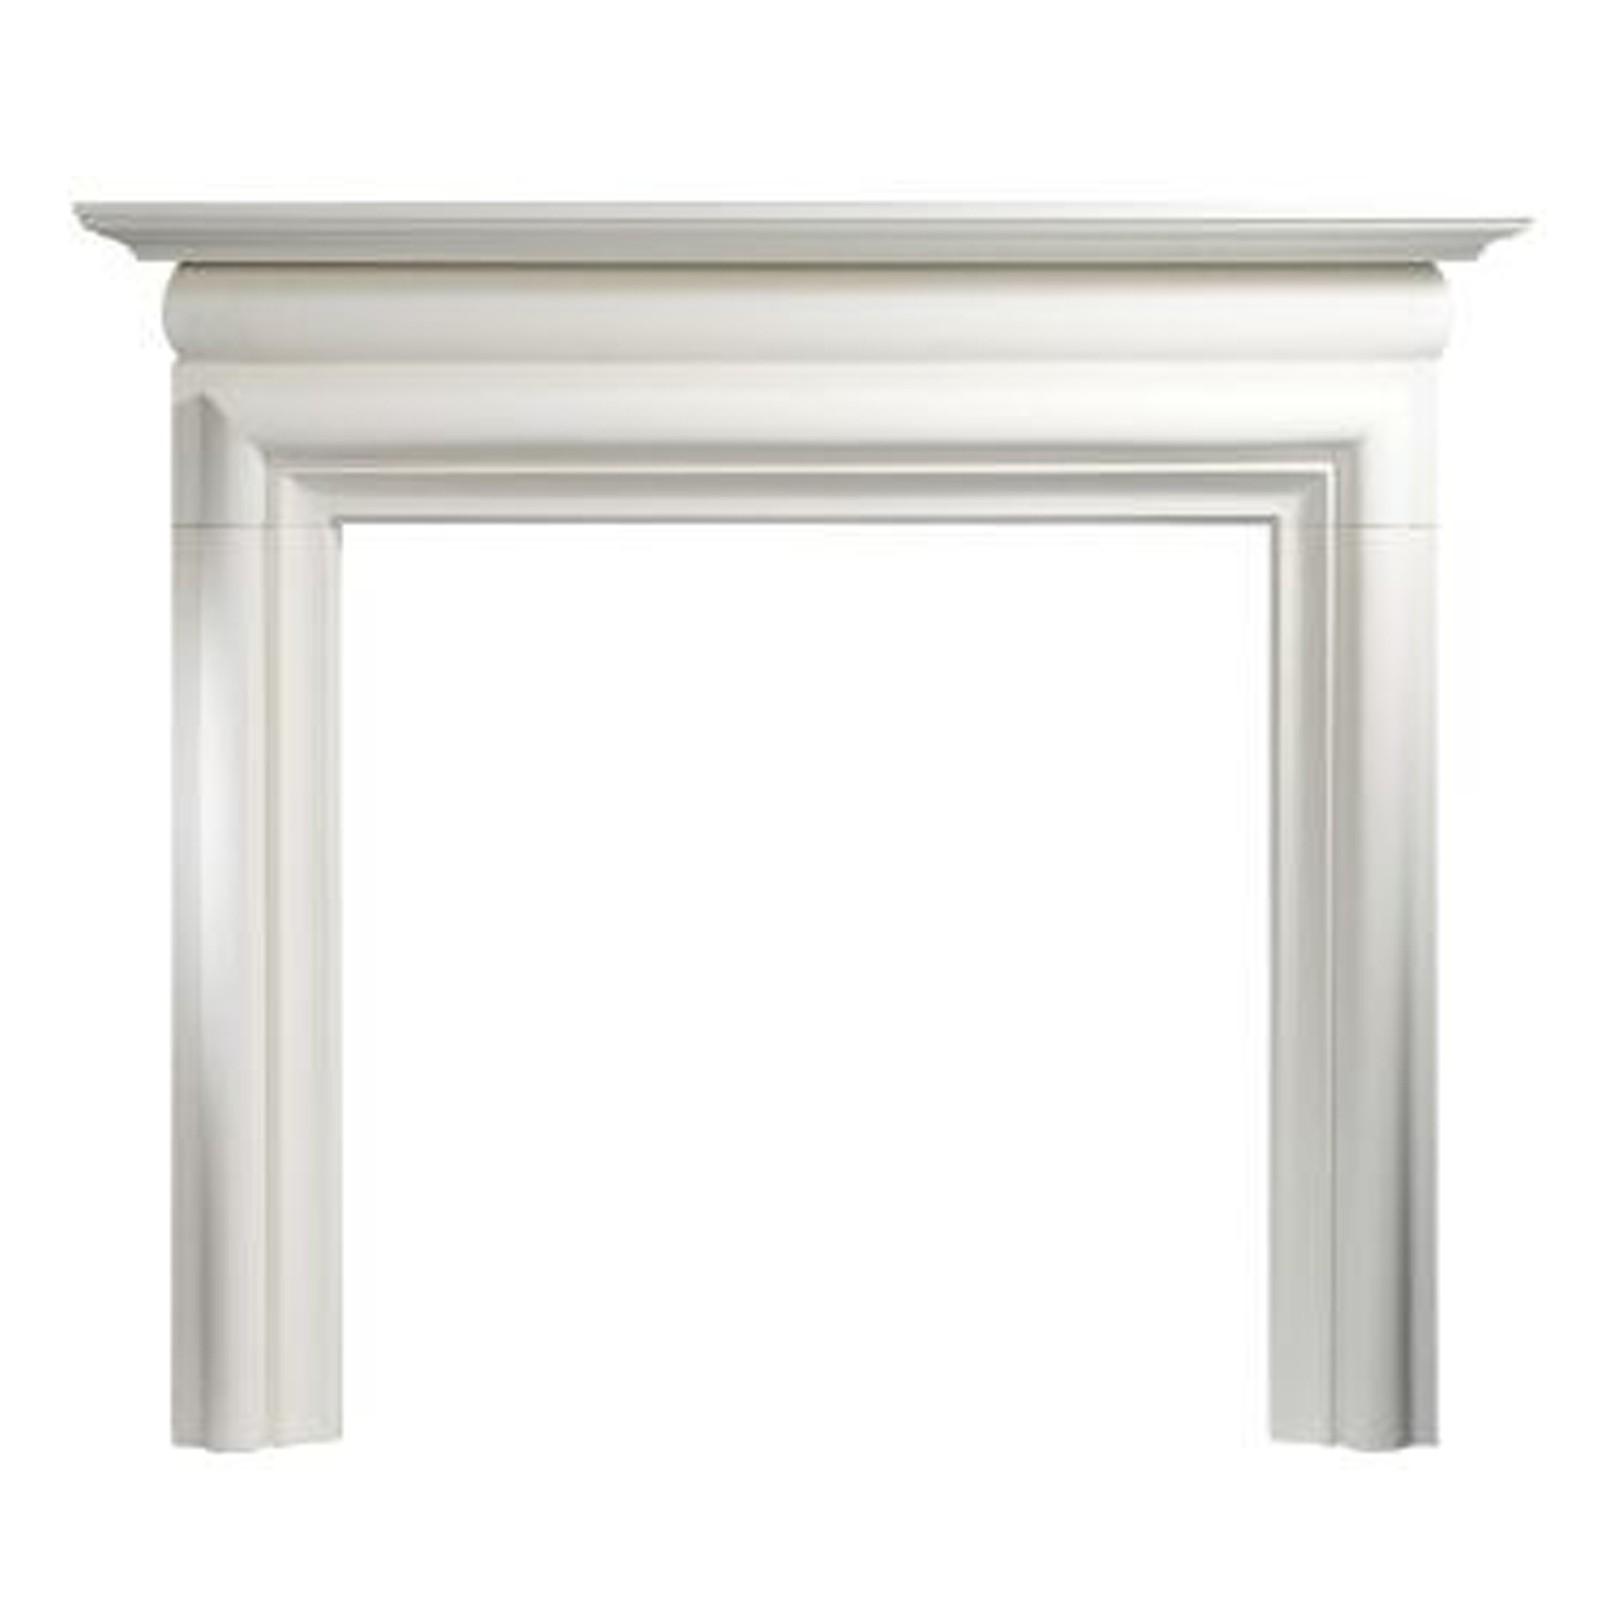 Gallery Asquith Limestone 55 Fireplace Surround Mantel